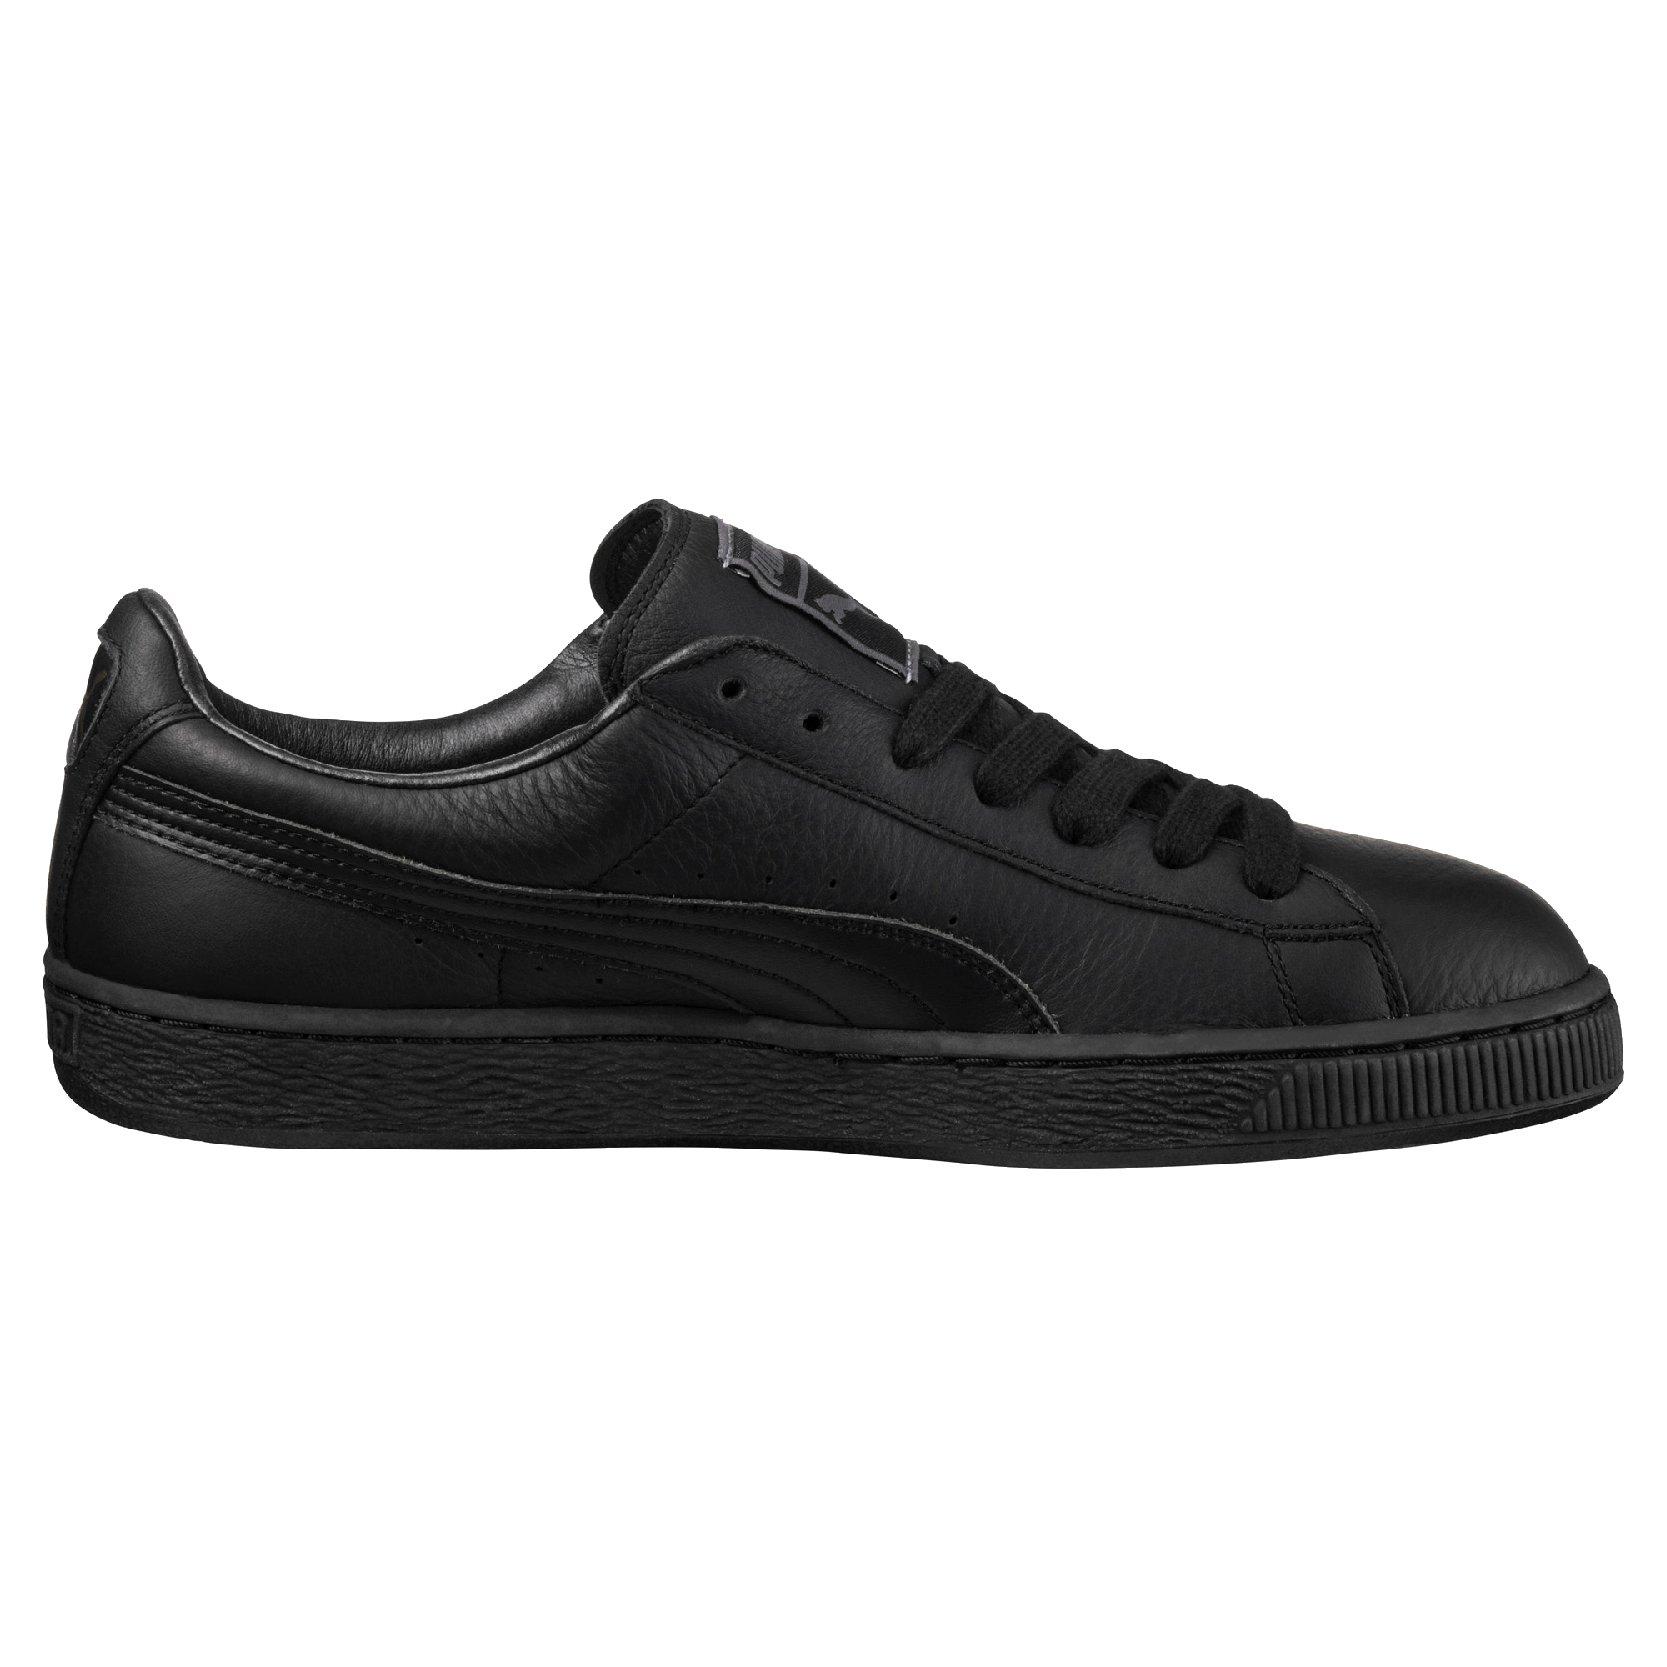 Shoes Puma Basket Classic LFS black-team gold